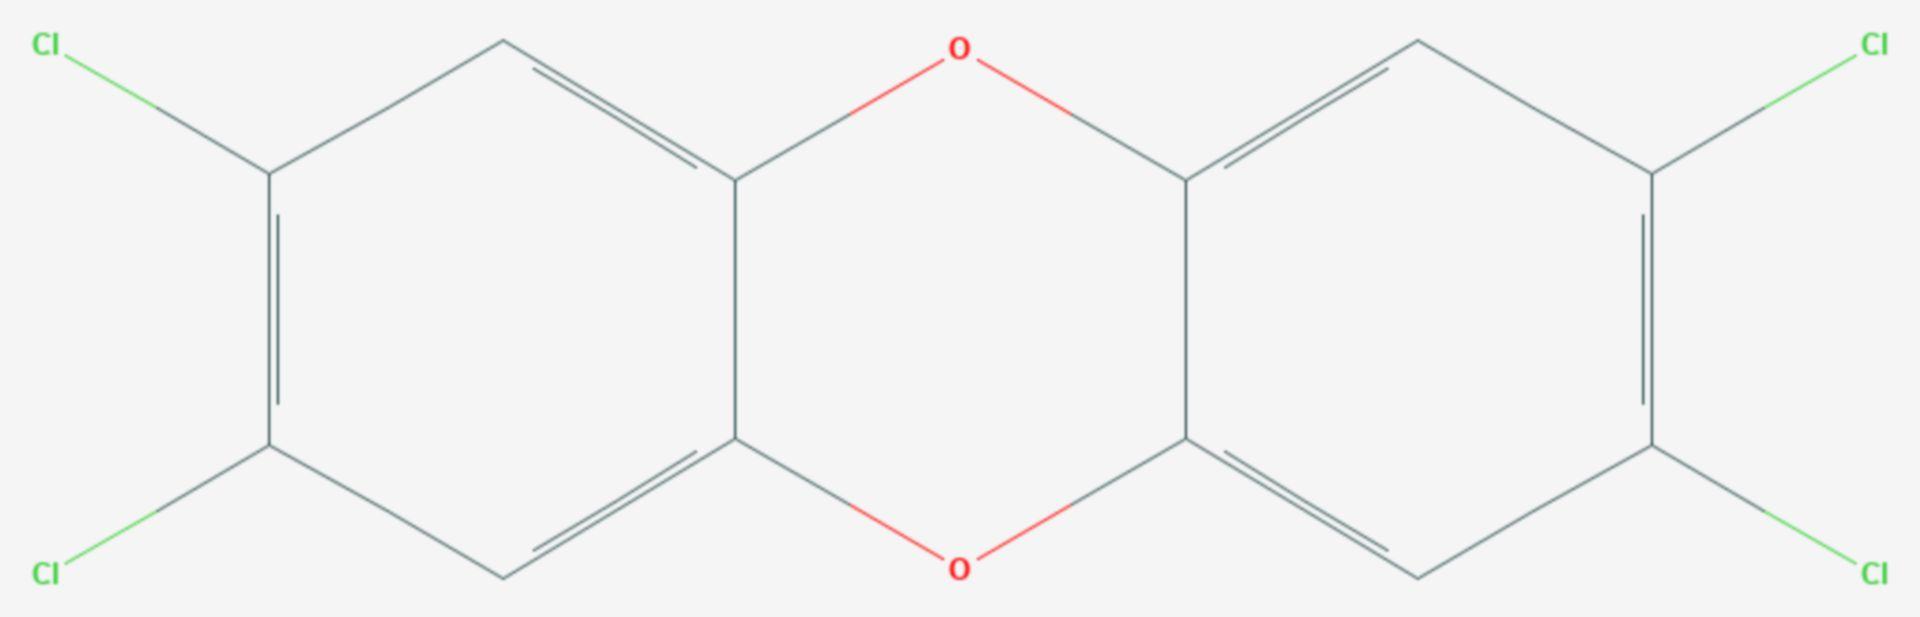 2,3,7,8-Tetrachlordibenzodioxin (Strukturformel)